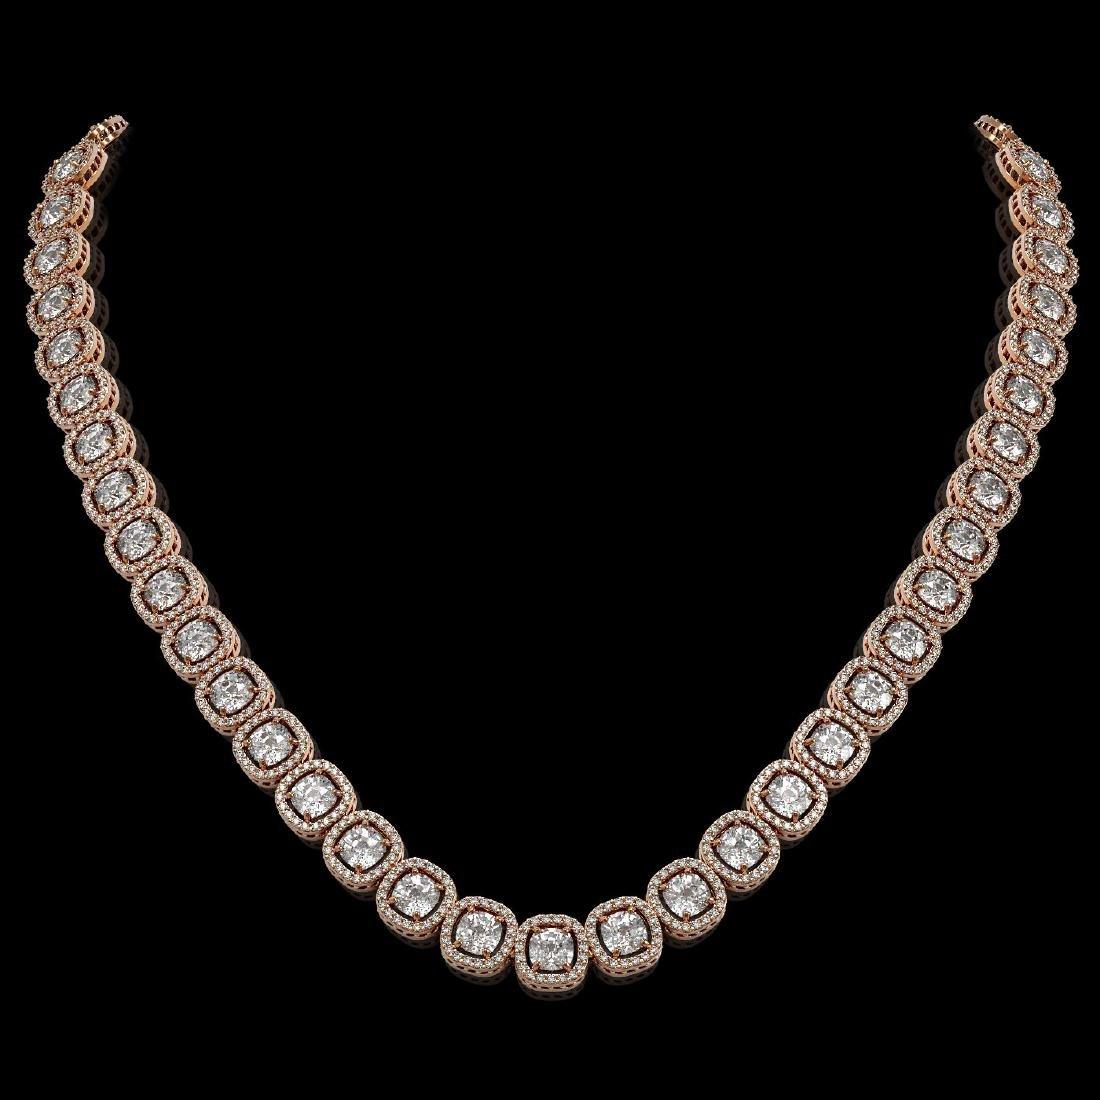 32.64 CTW Cushion Diamond Designer Necklace 18K Rose